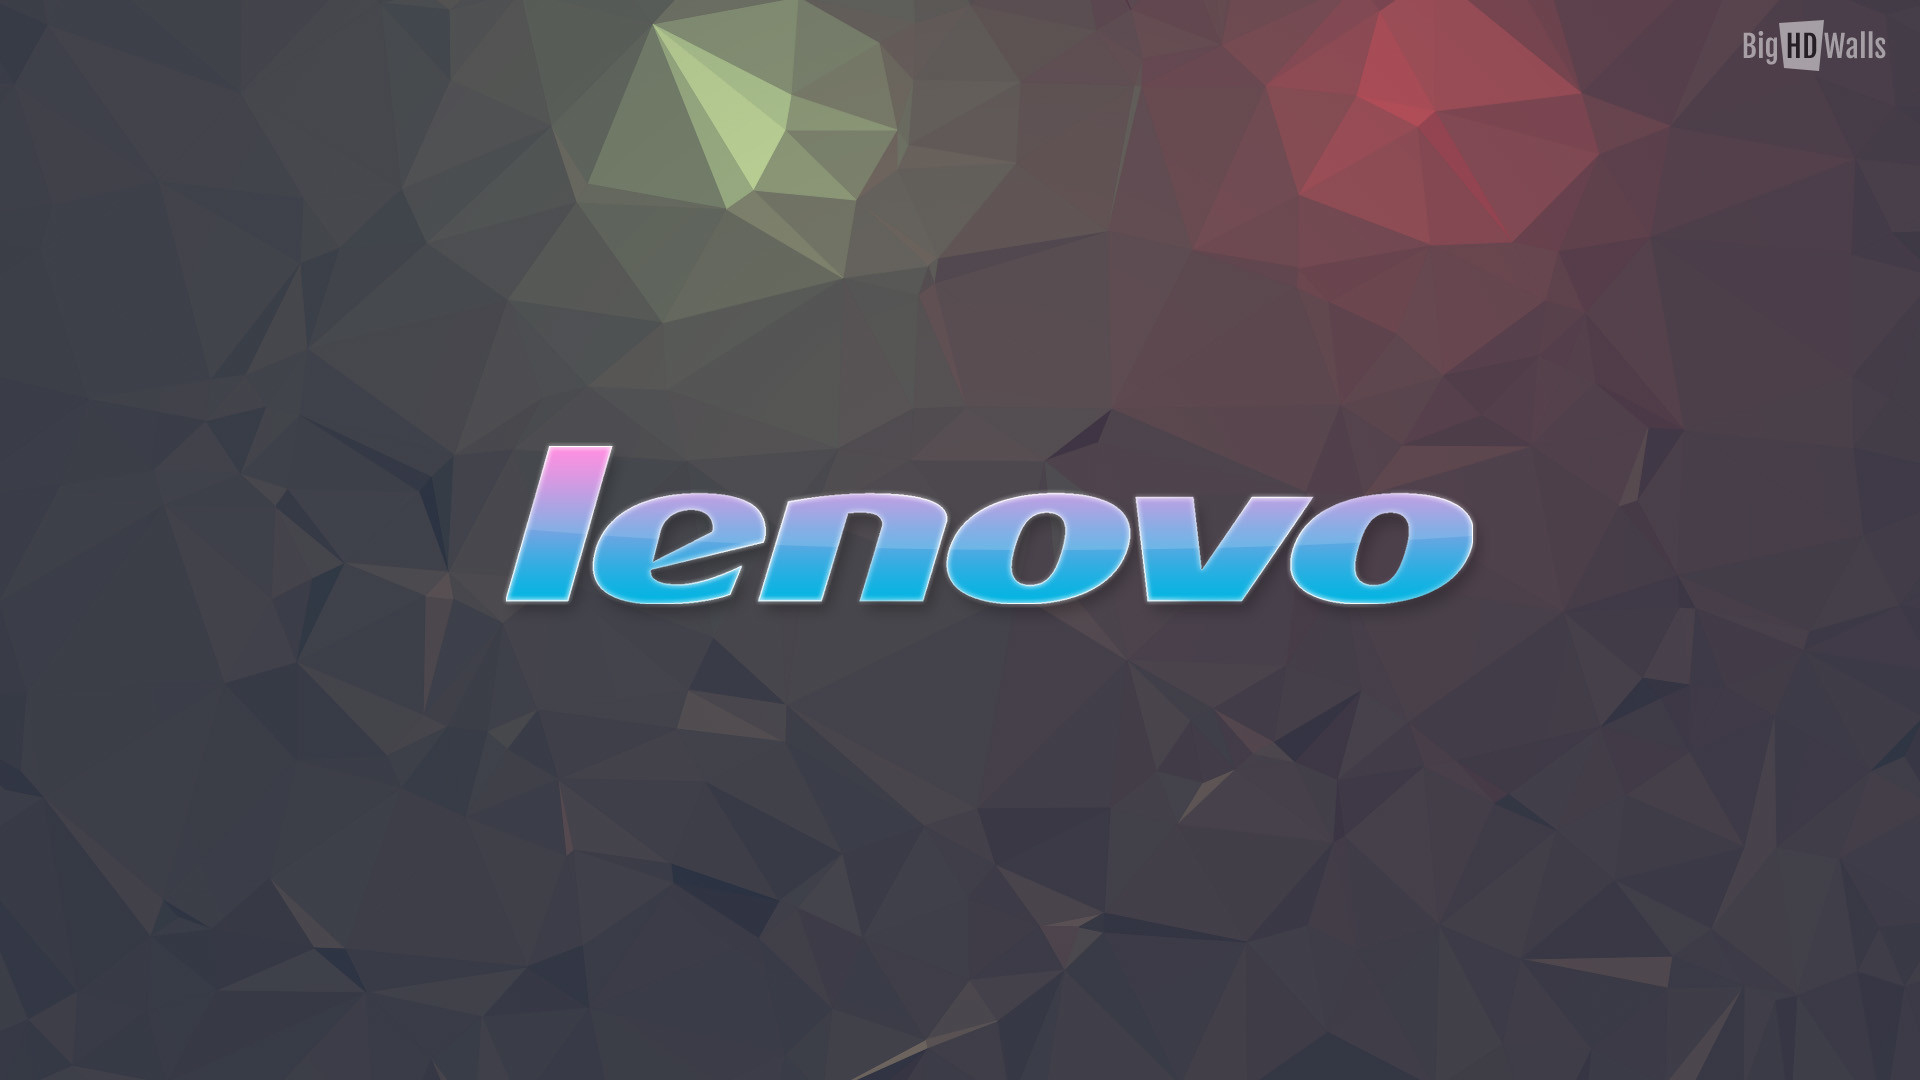 Обои Lenovo На Рабочий